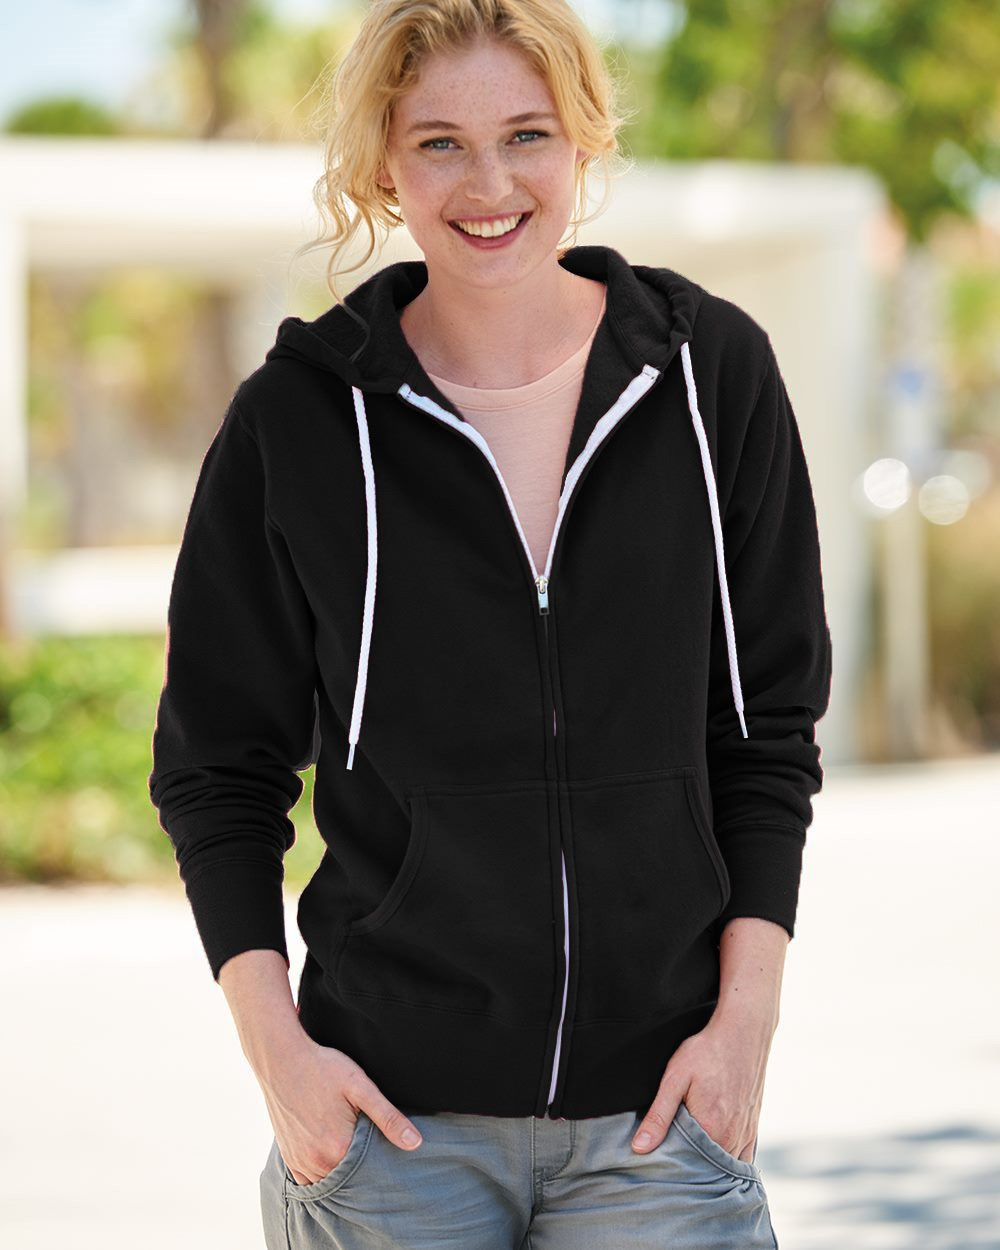 Independent Trading Co. AFX90UZ - Unisex Lightweight Full-Zip Hooded Sweatshirt